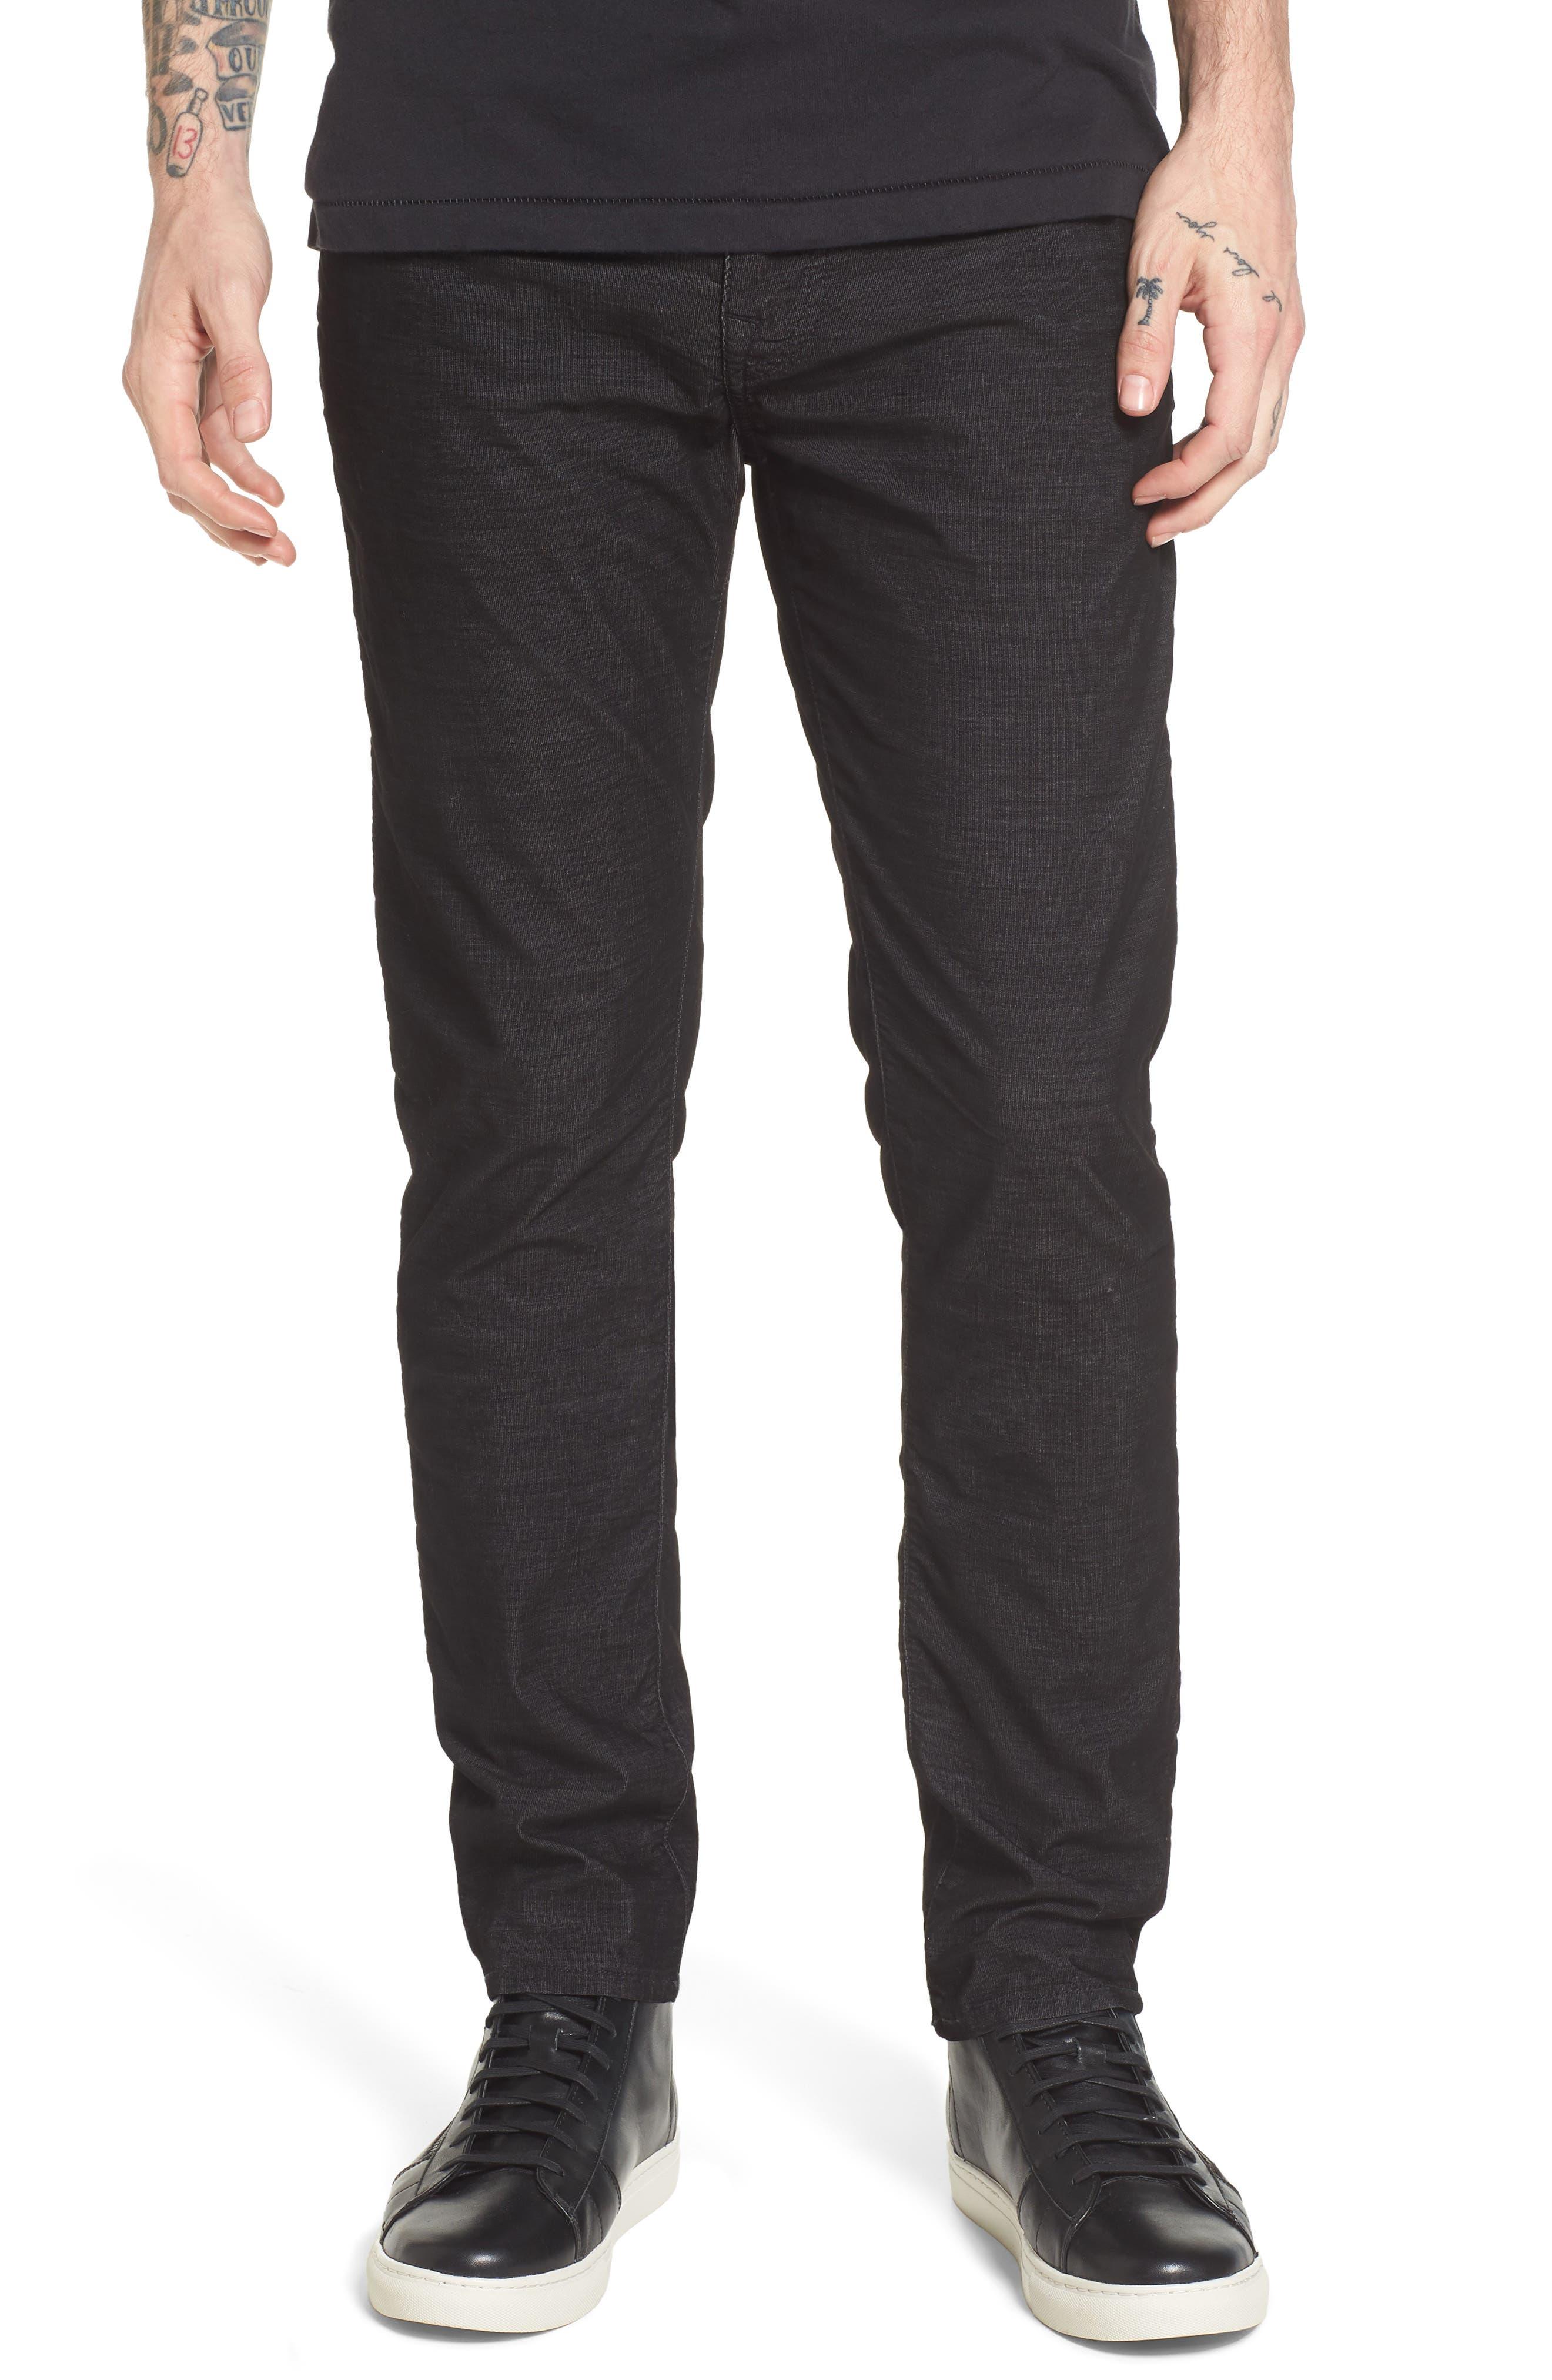 Rocco Skinny Fit Corduroy Jeans,                             Main thumbnail 1, color,                             Black